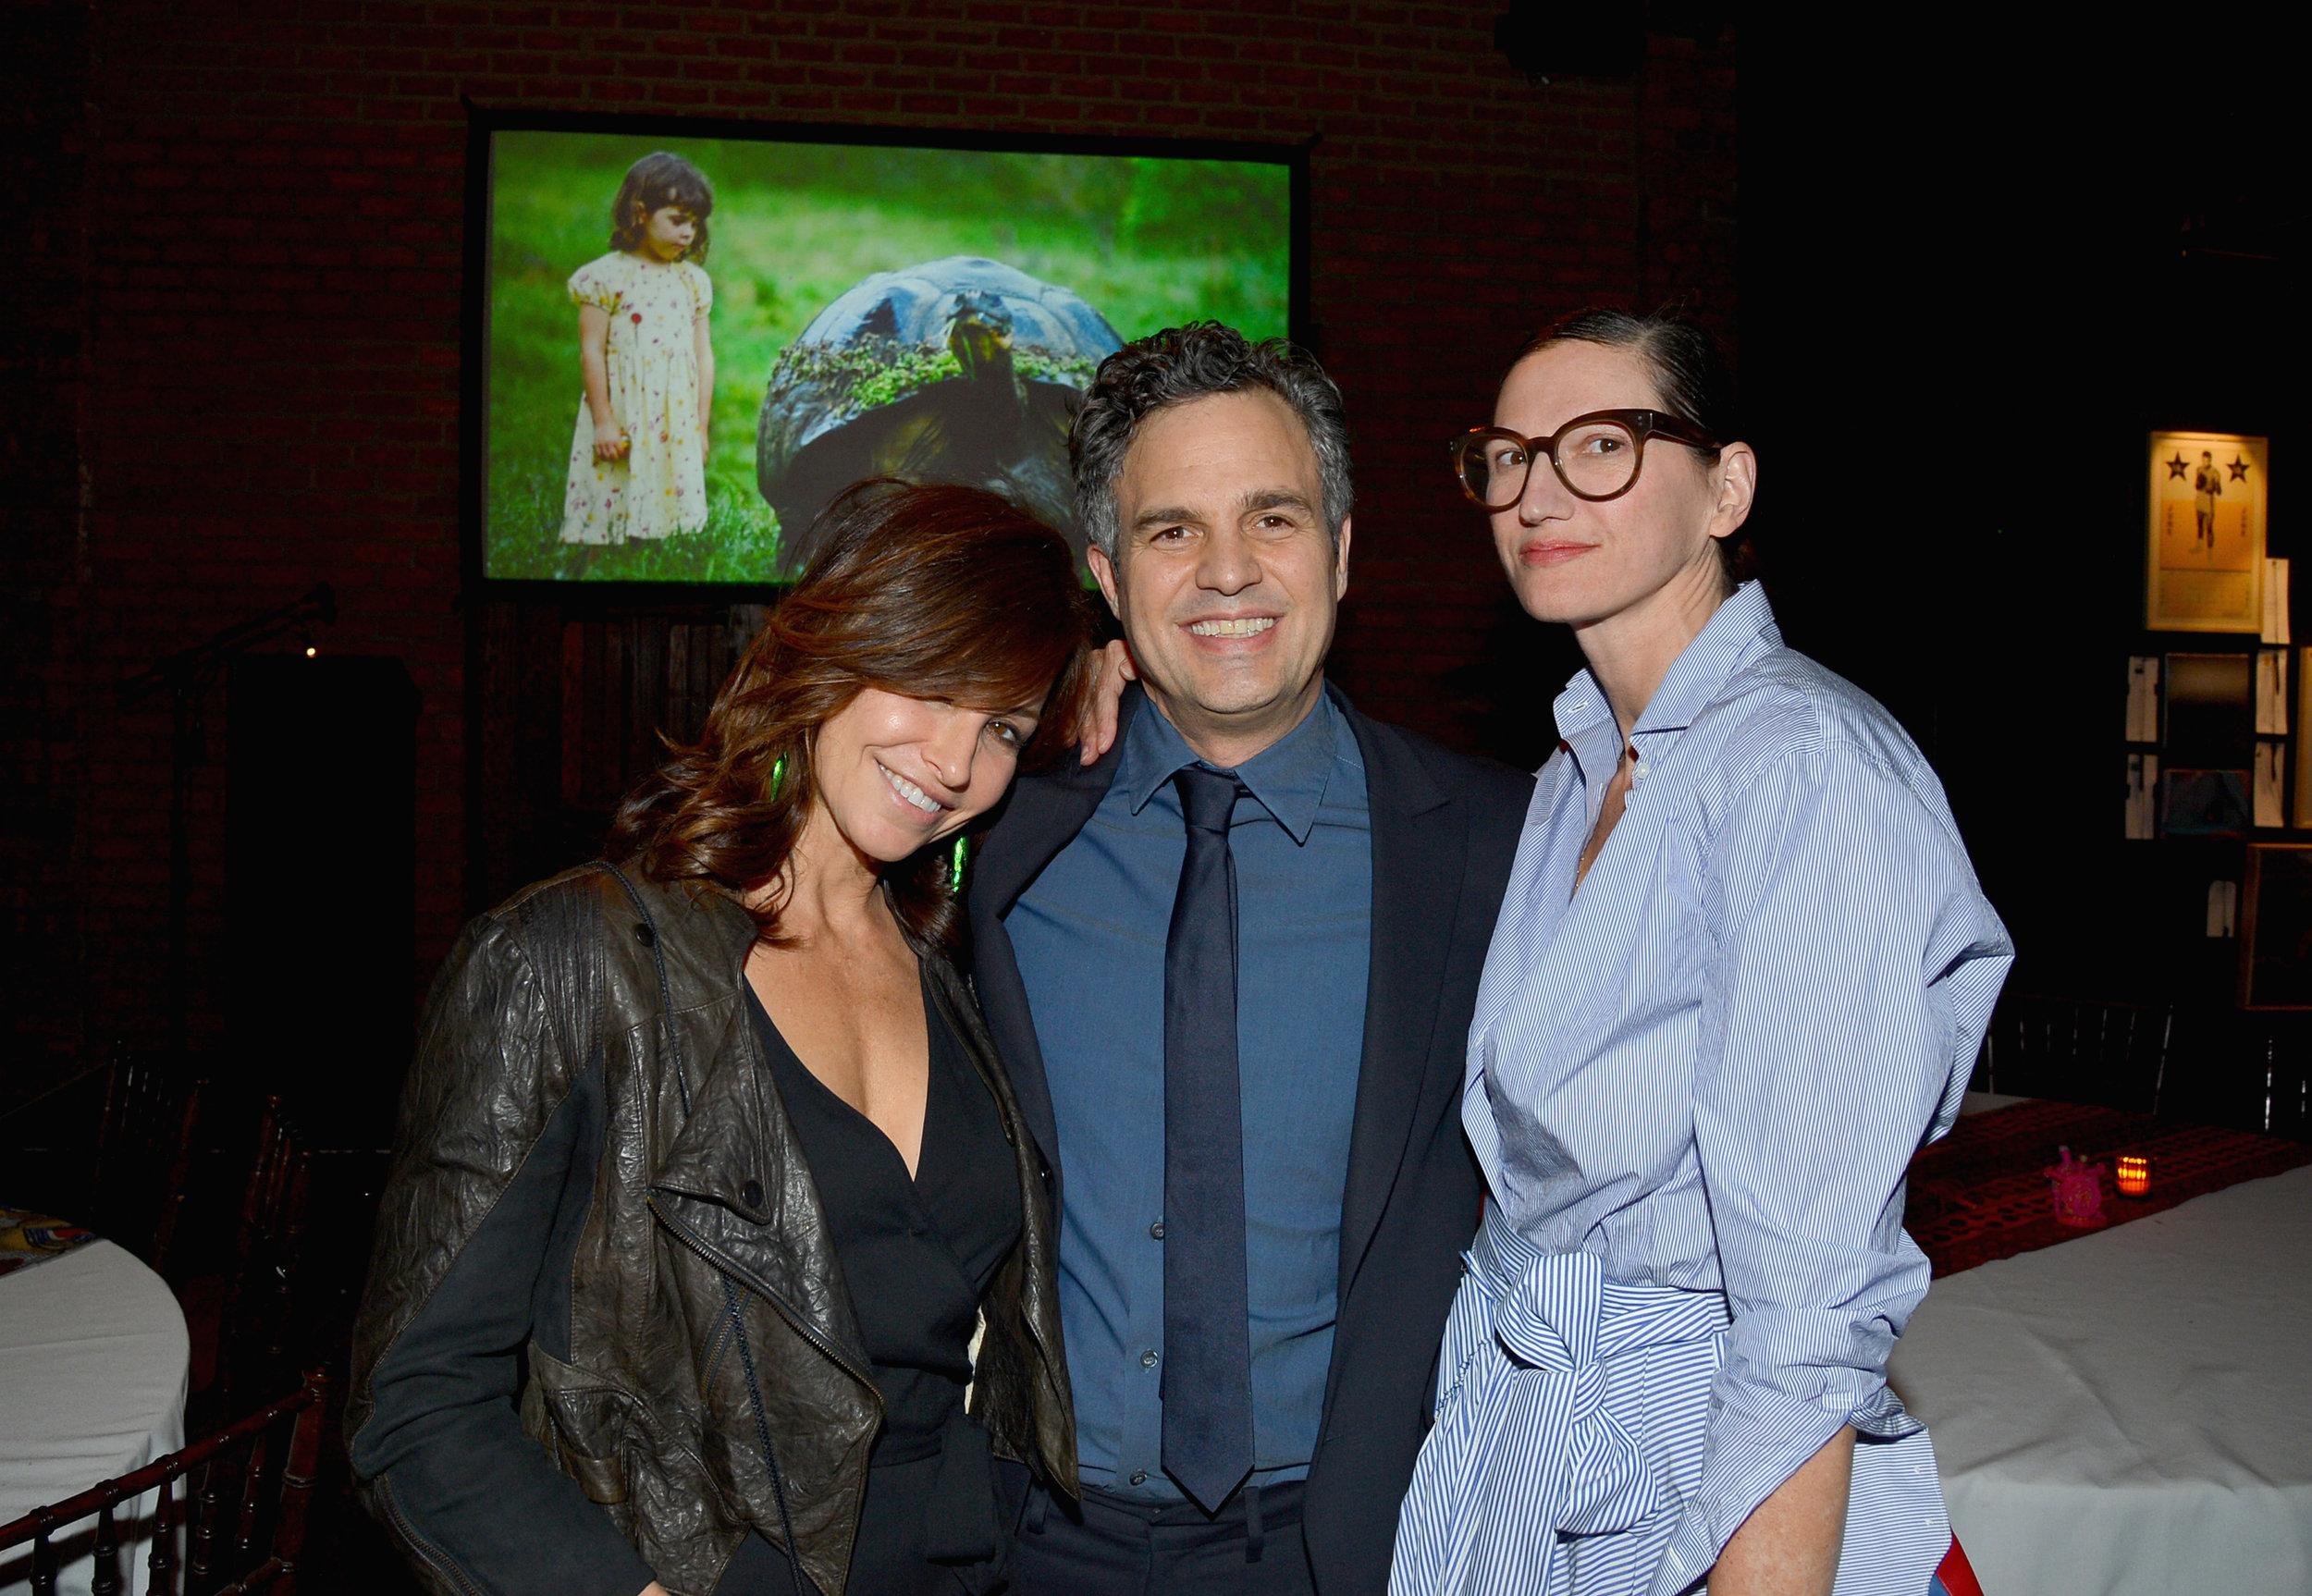 Gina Gershon, Mark Ruffalo, and Jenna Lyons